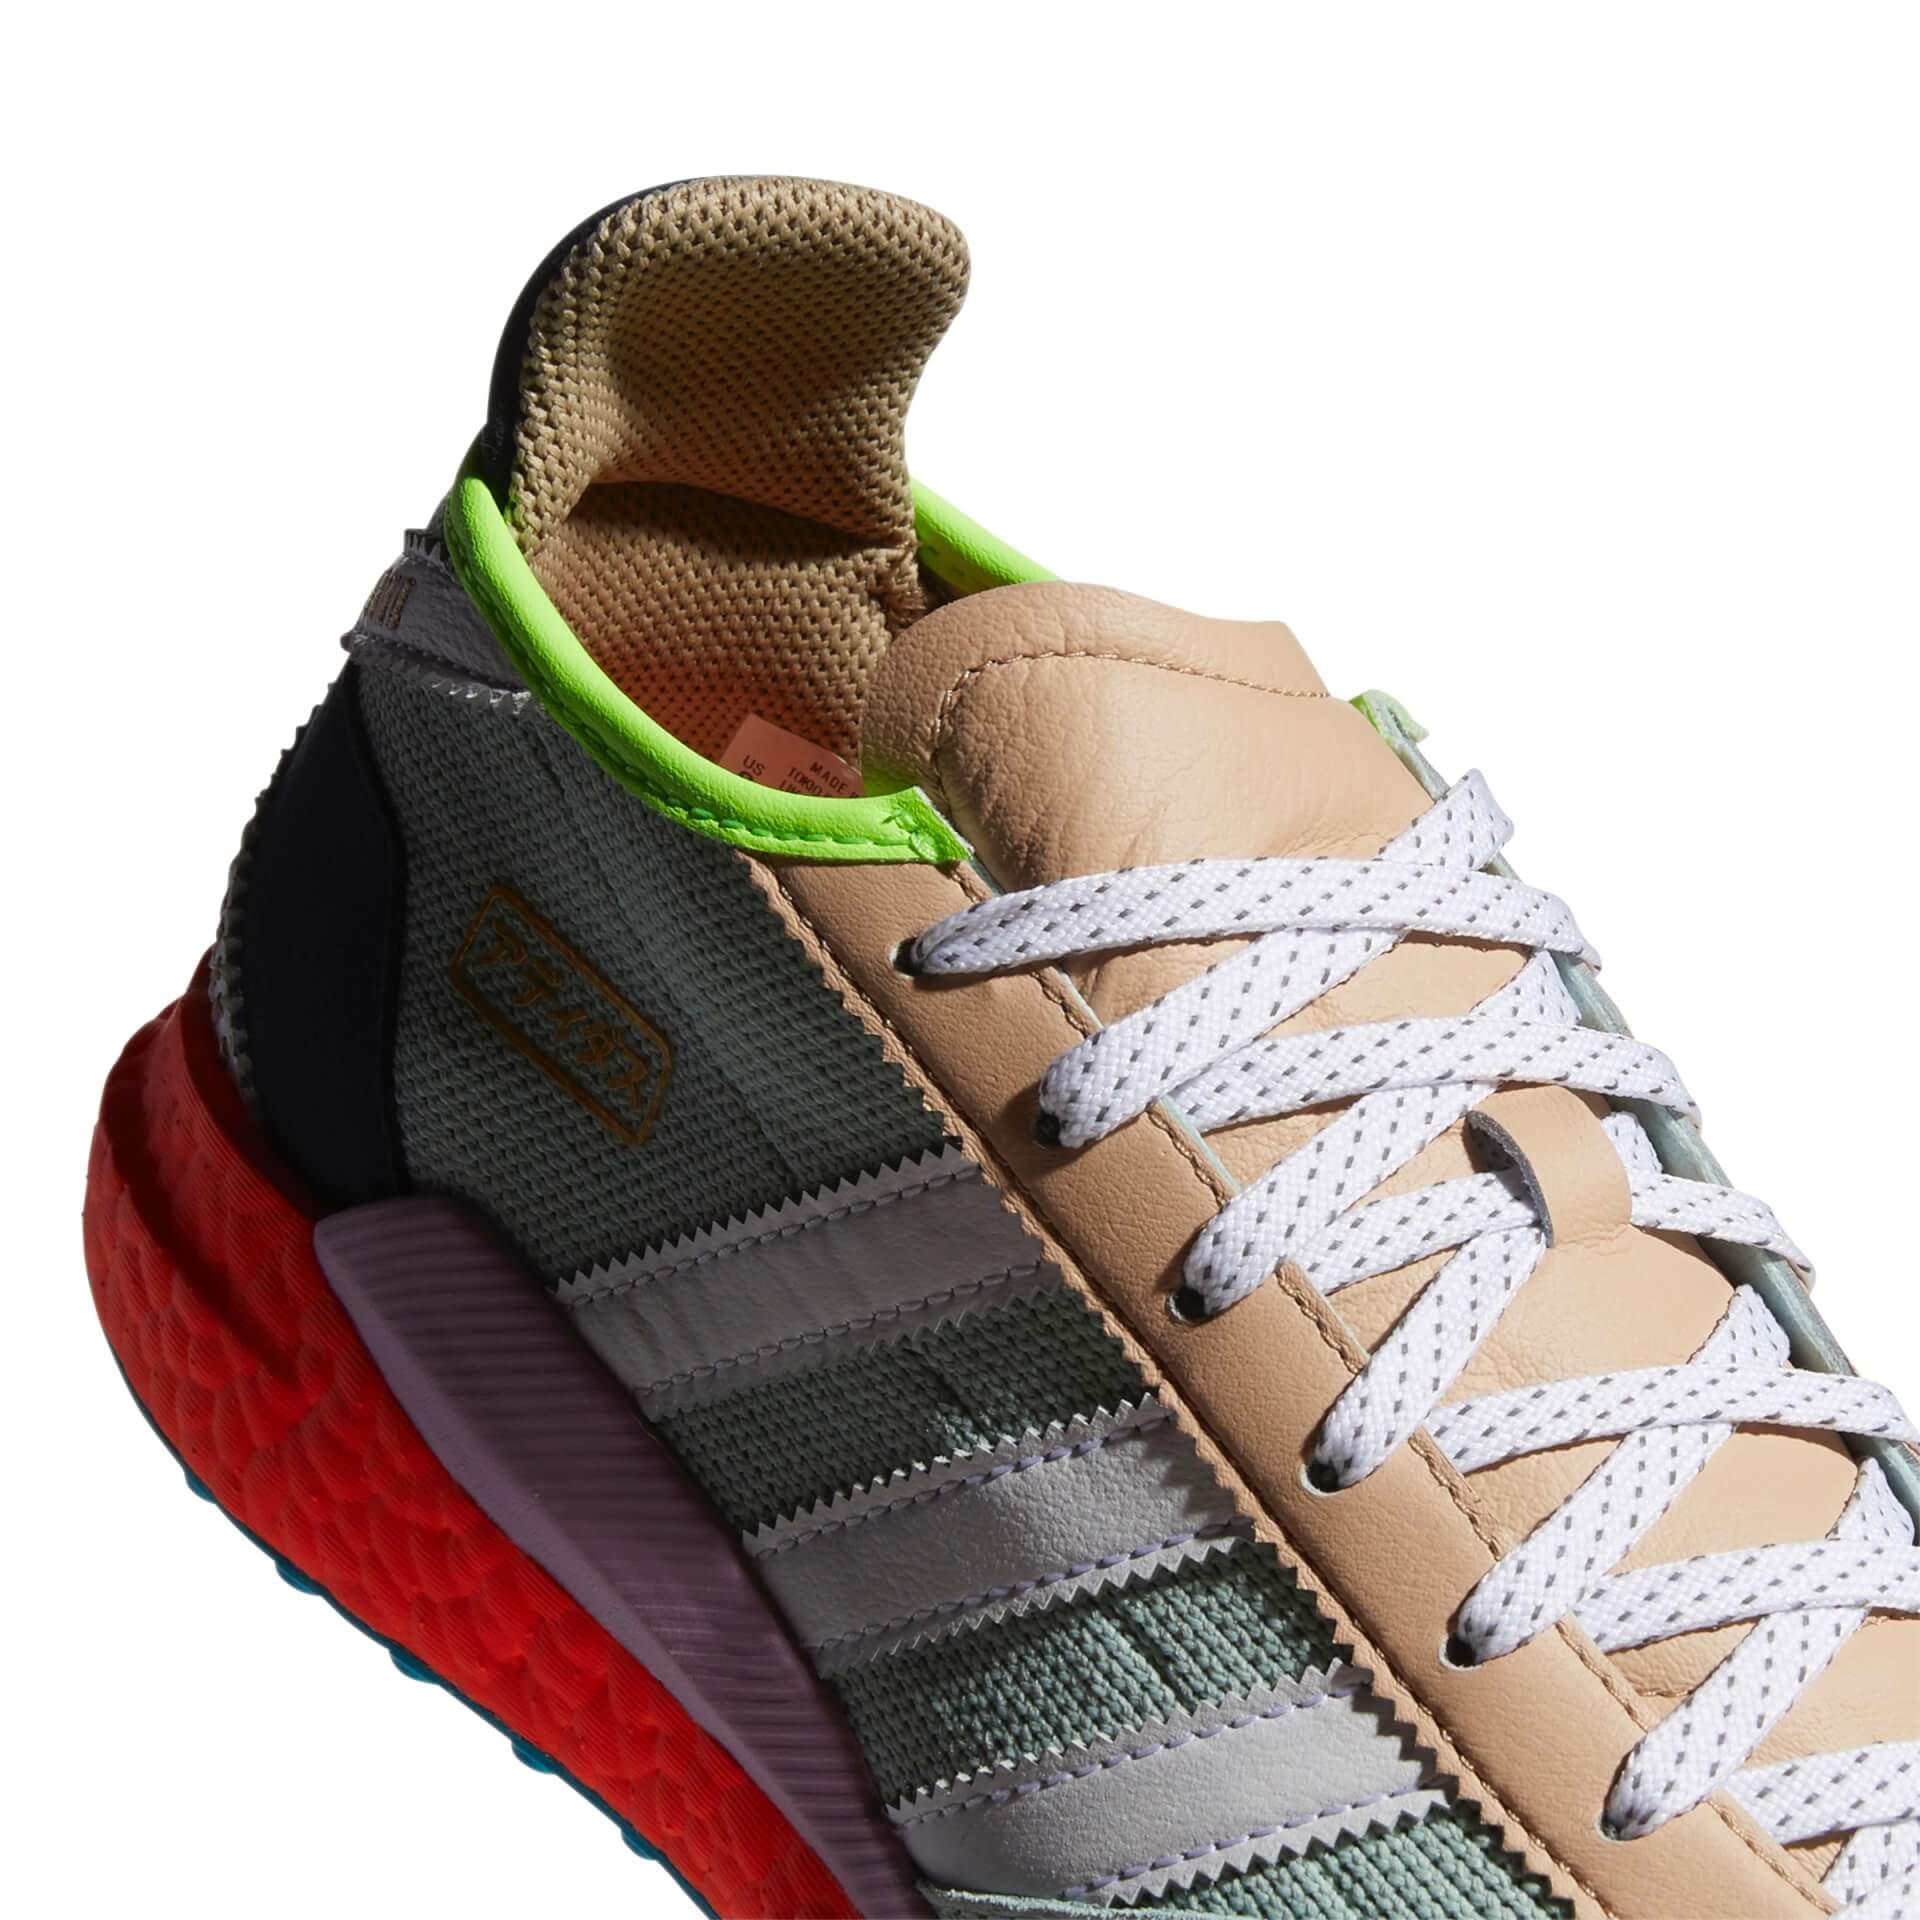 adidas Originalsから『Pharrell Williams x NIGO(R)FRIENDSHIP PACK』が発売!2種類のフットウェアが登場 fashion201217_adidas_pharrell_nigo_18